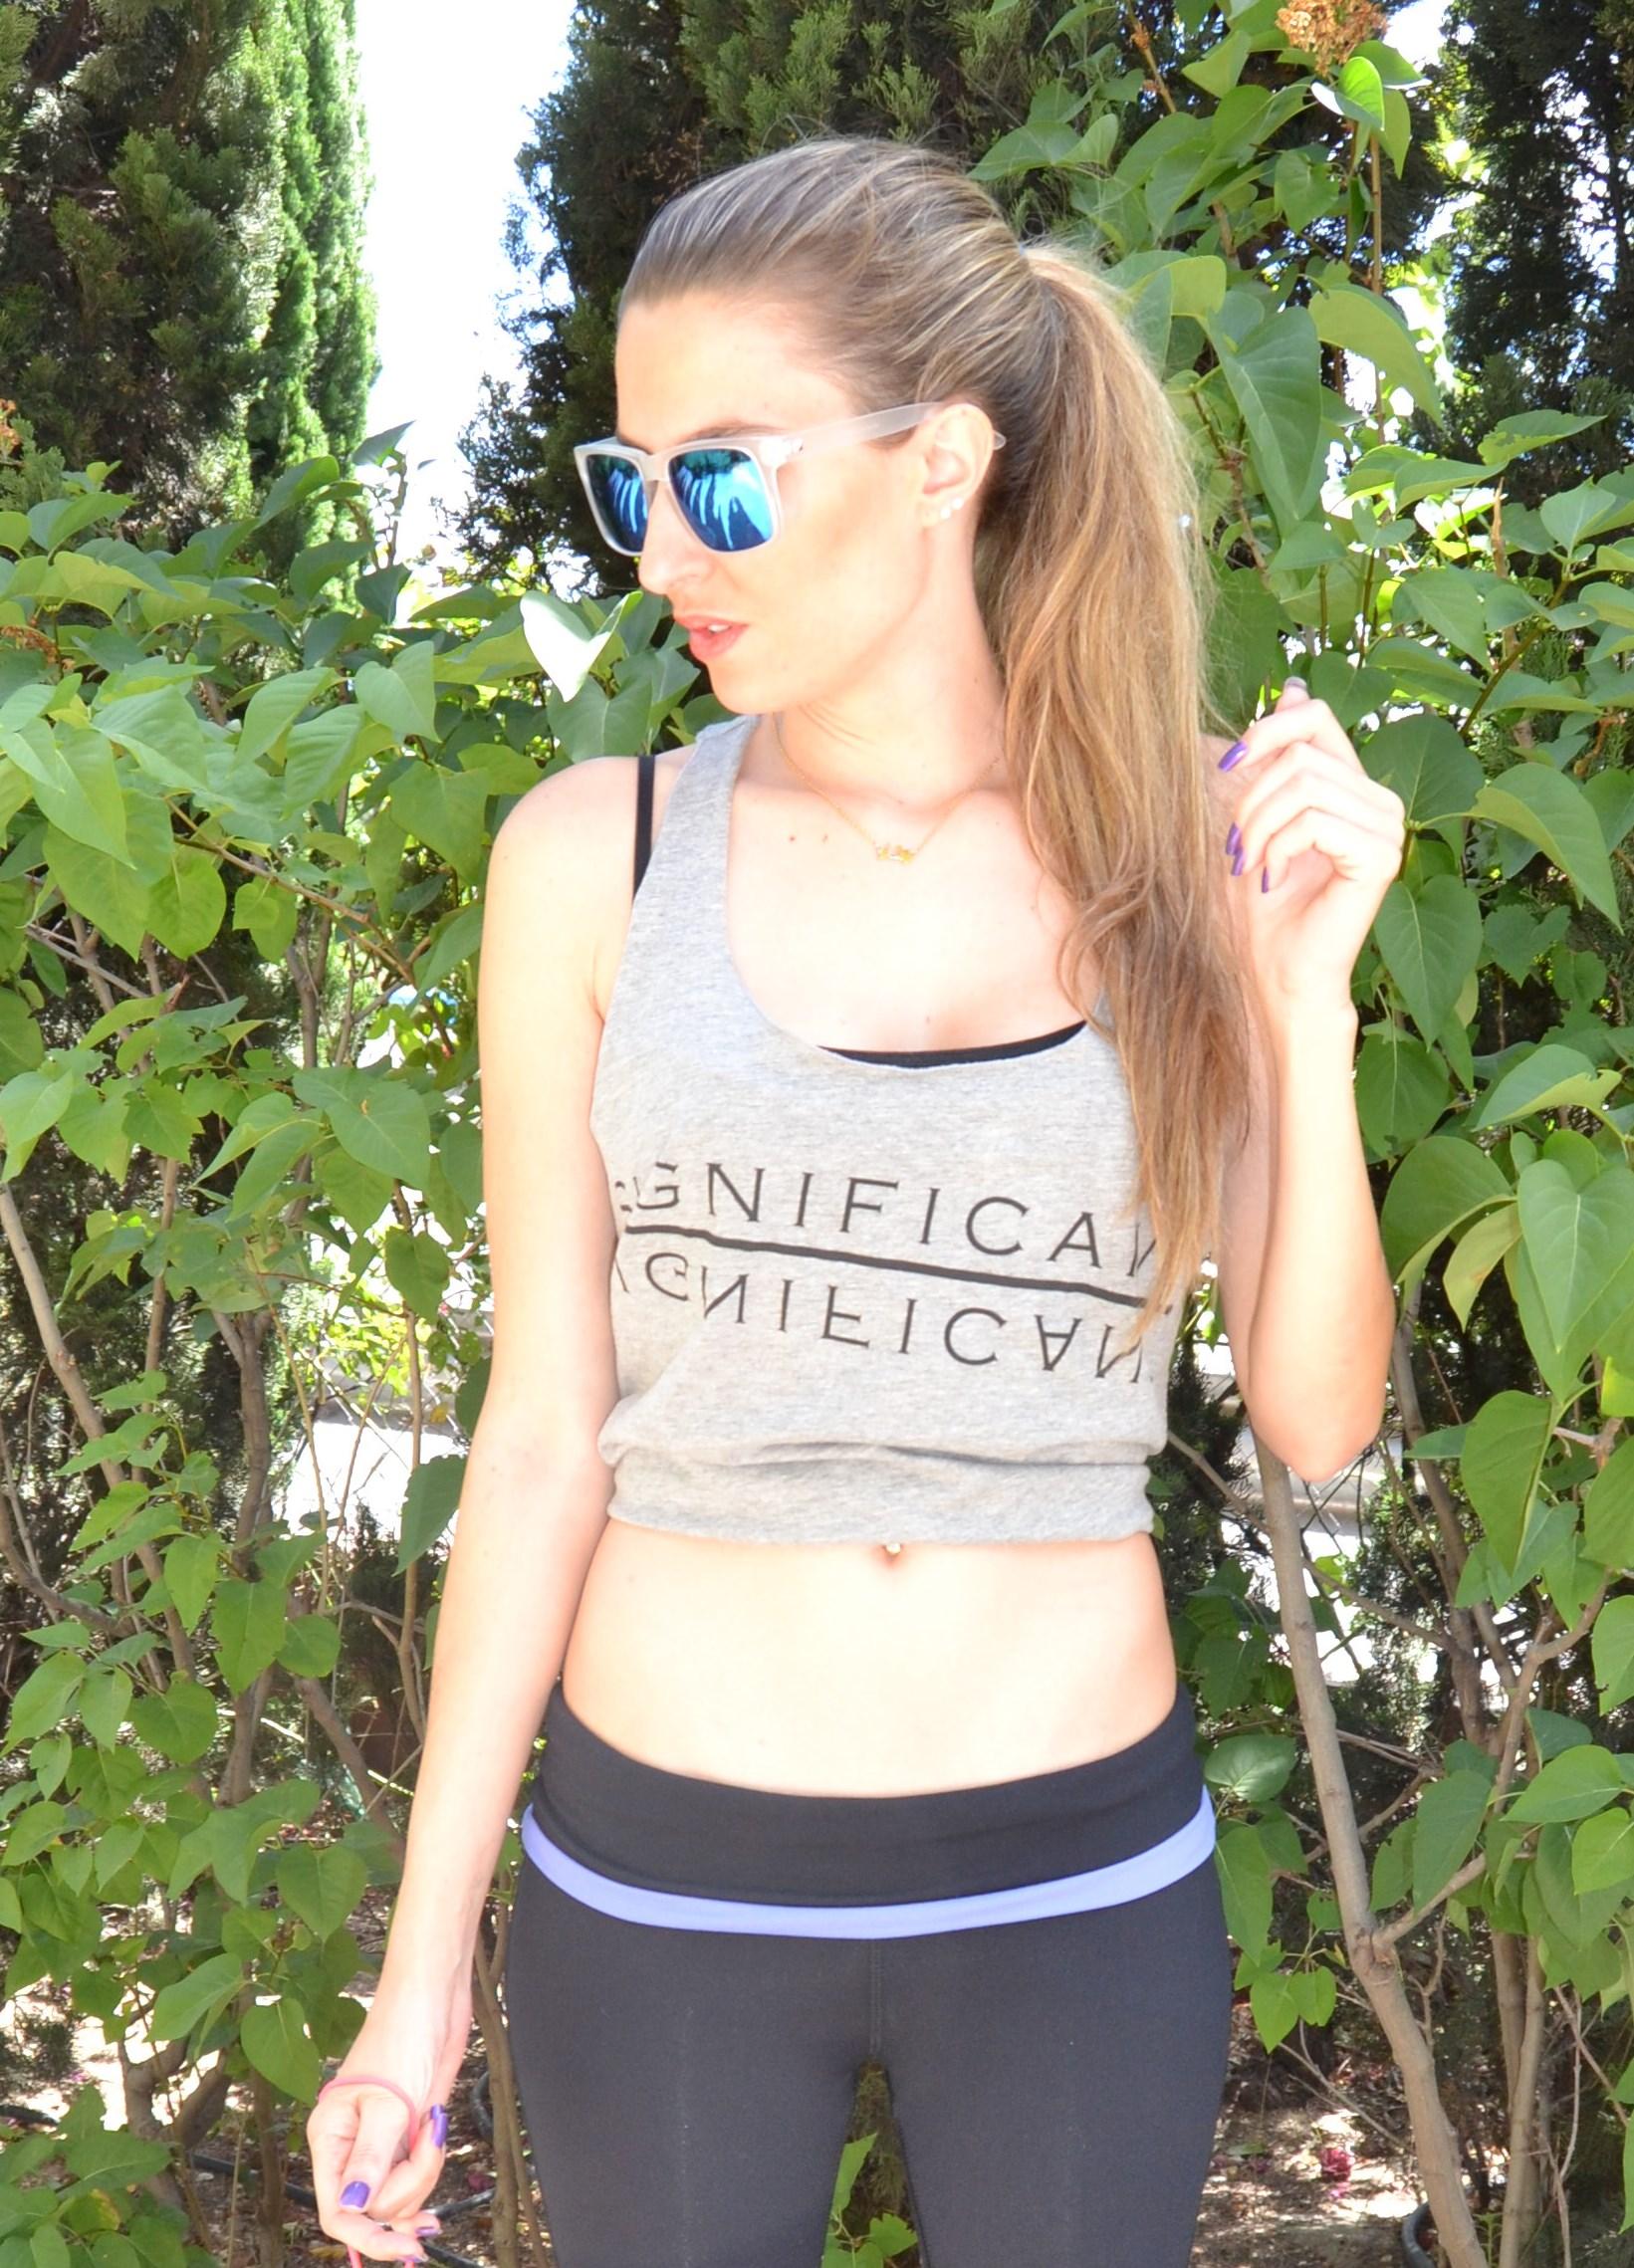 HerbaPremium_Healthy_Life_Sporty_Outfit_Fitness_Nike_Free_Flyknit_Mirror_Sunnies_Lara_Martin_Gilarranz_Bymyheels (2)